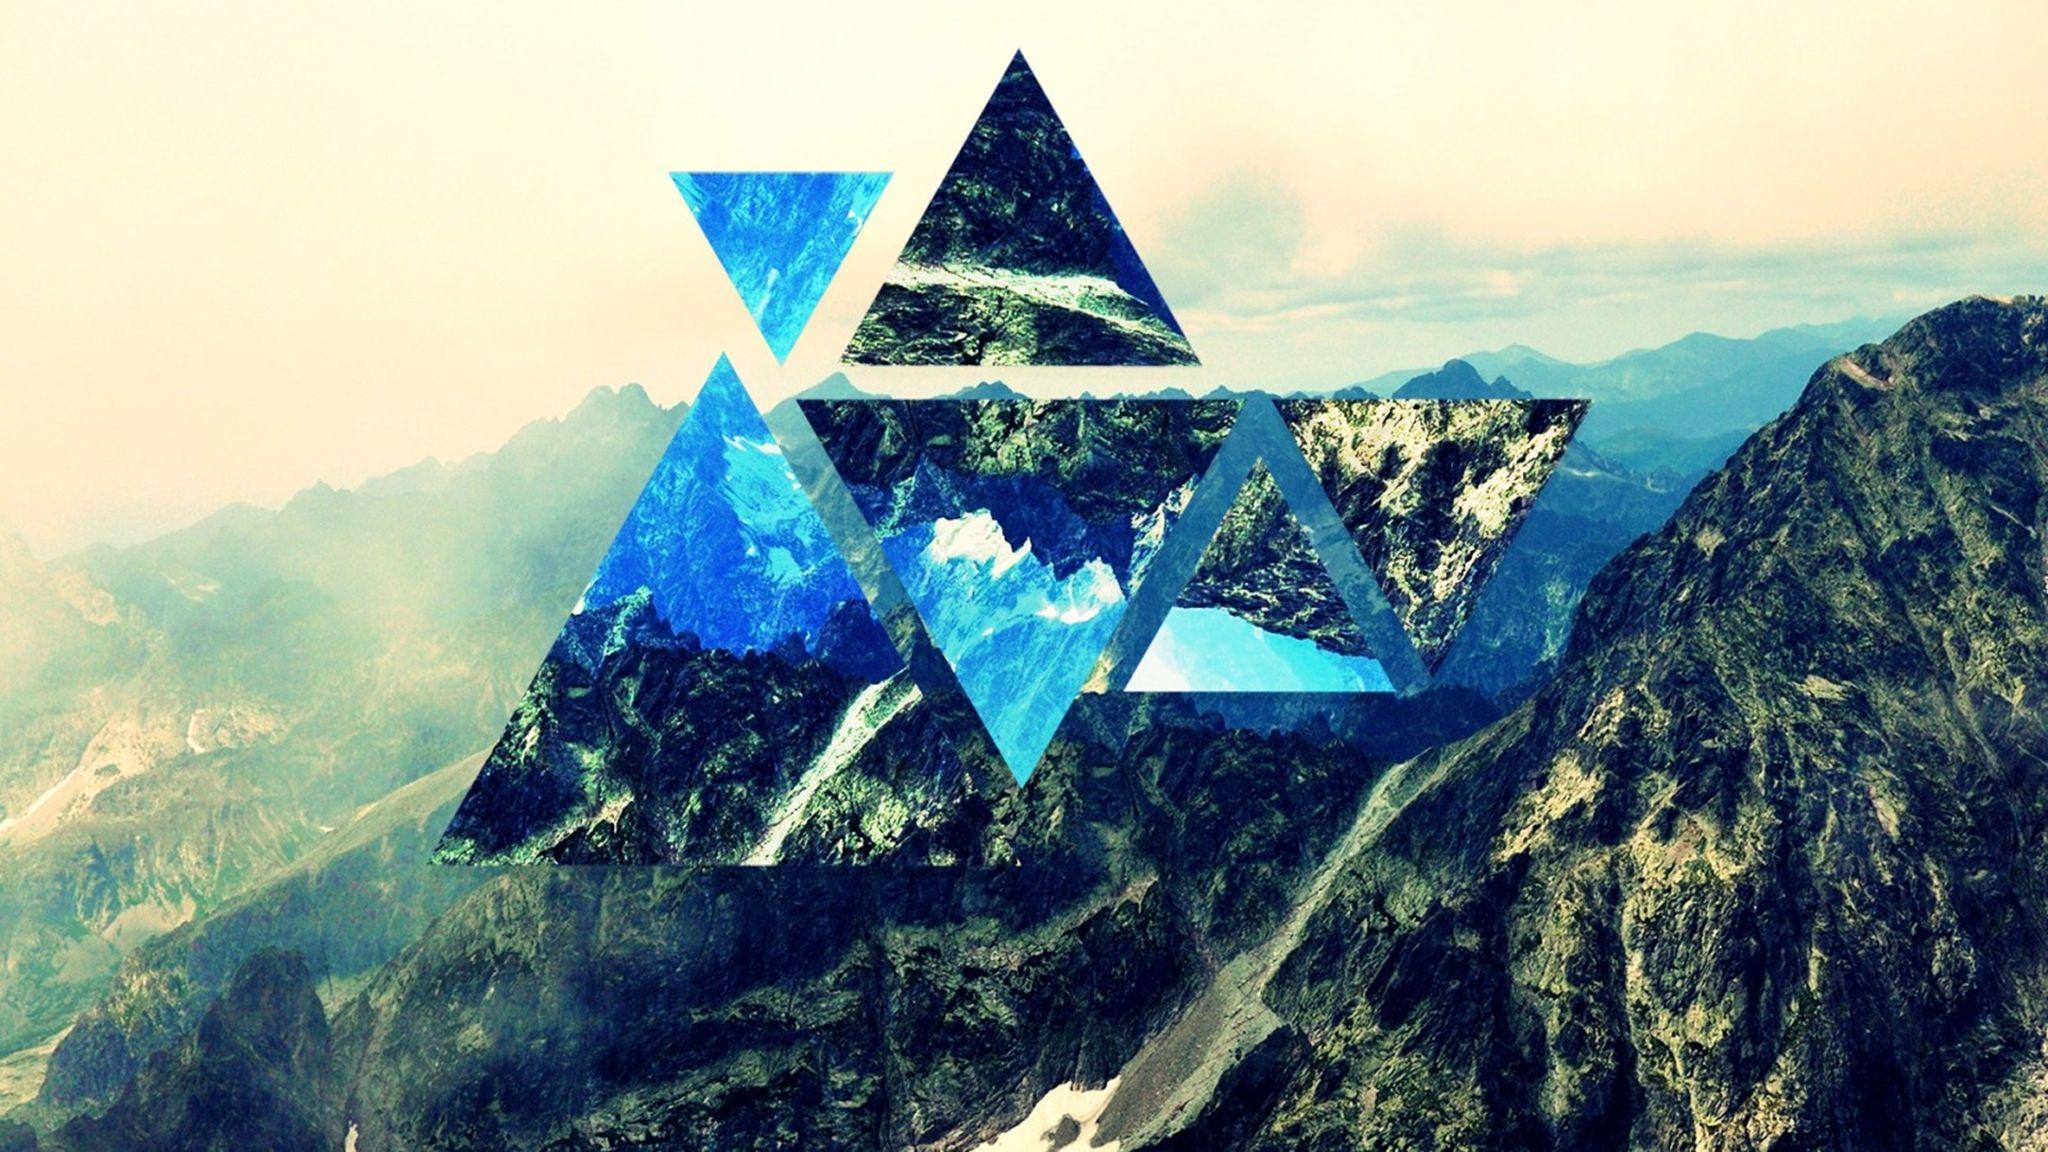 Best Wallpaper Mountain Hipster - 3aa2145d5fe768ea88df390e1249c8ba  Collection_61905.jpg